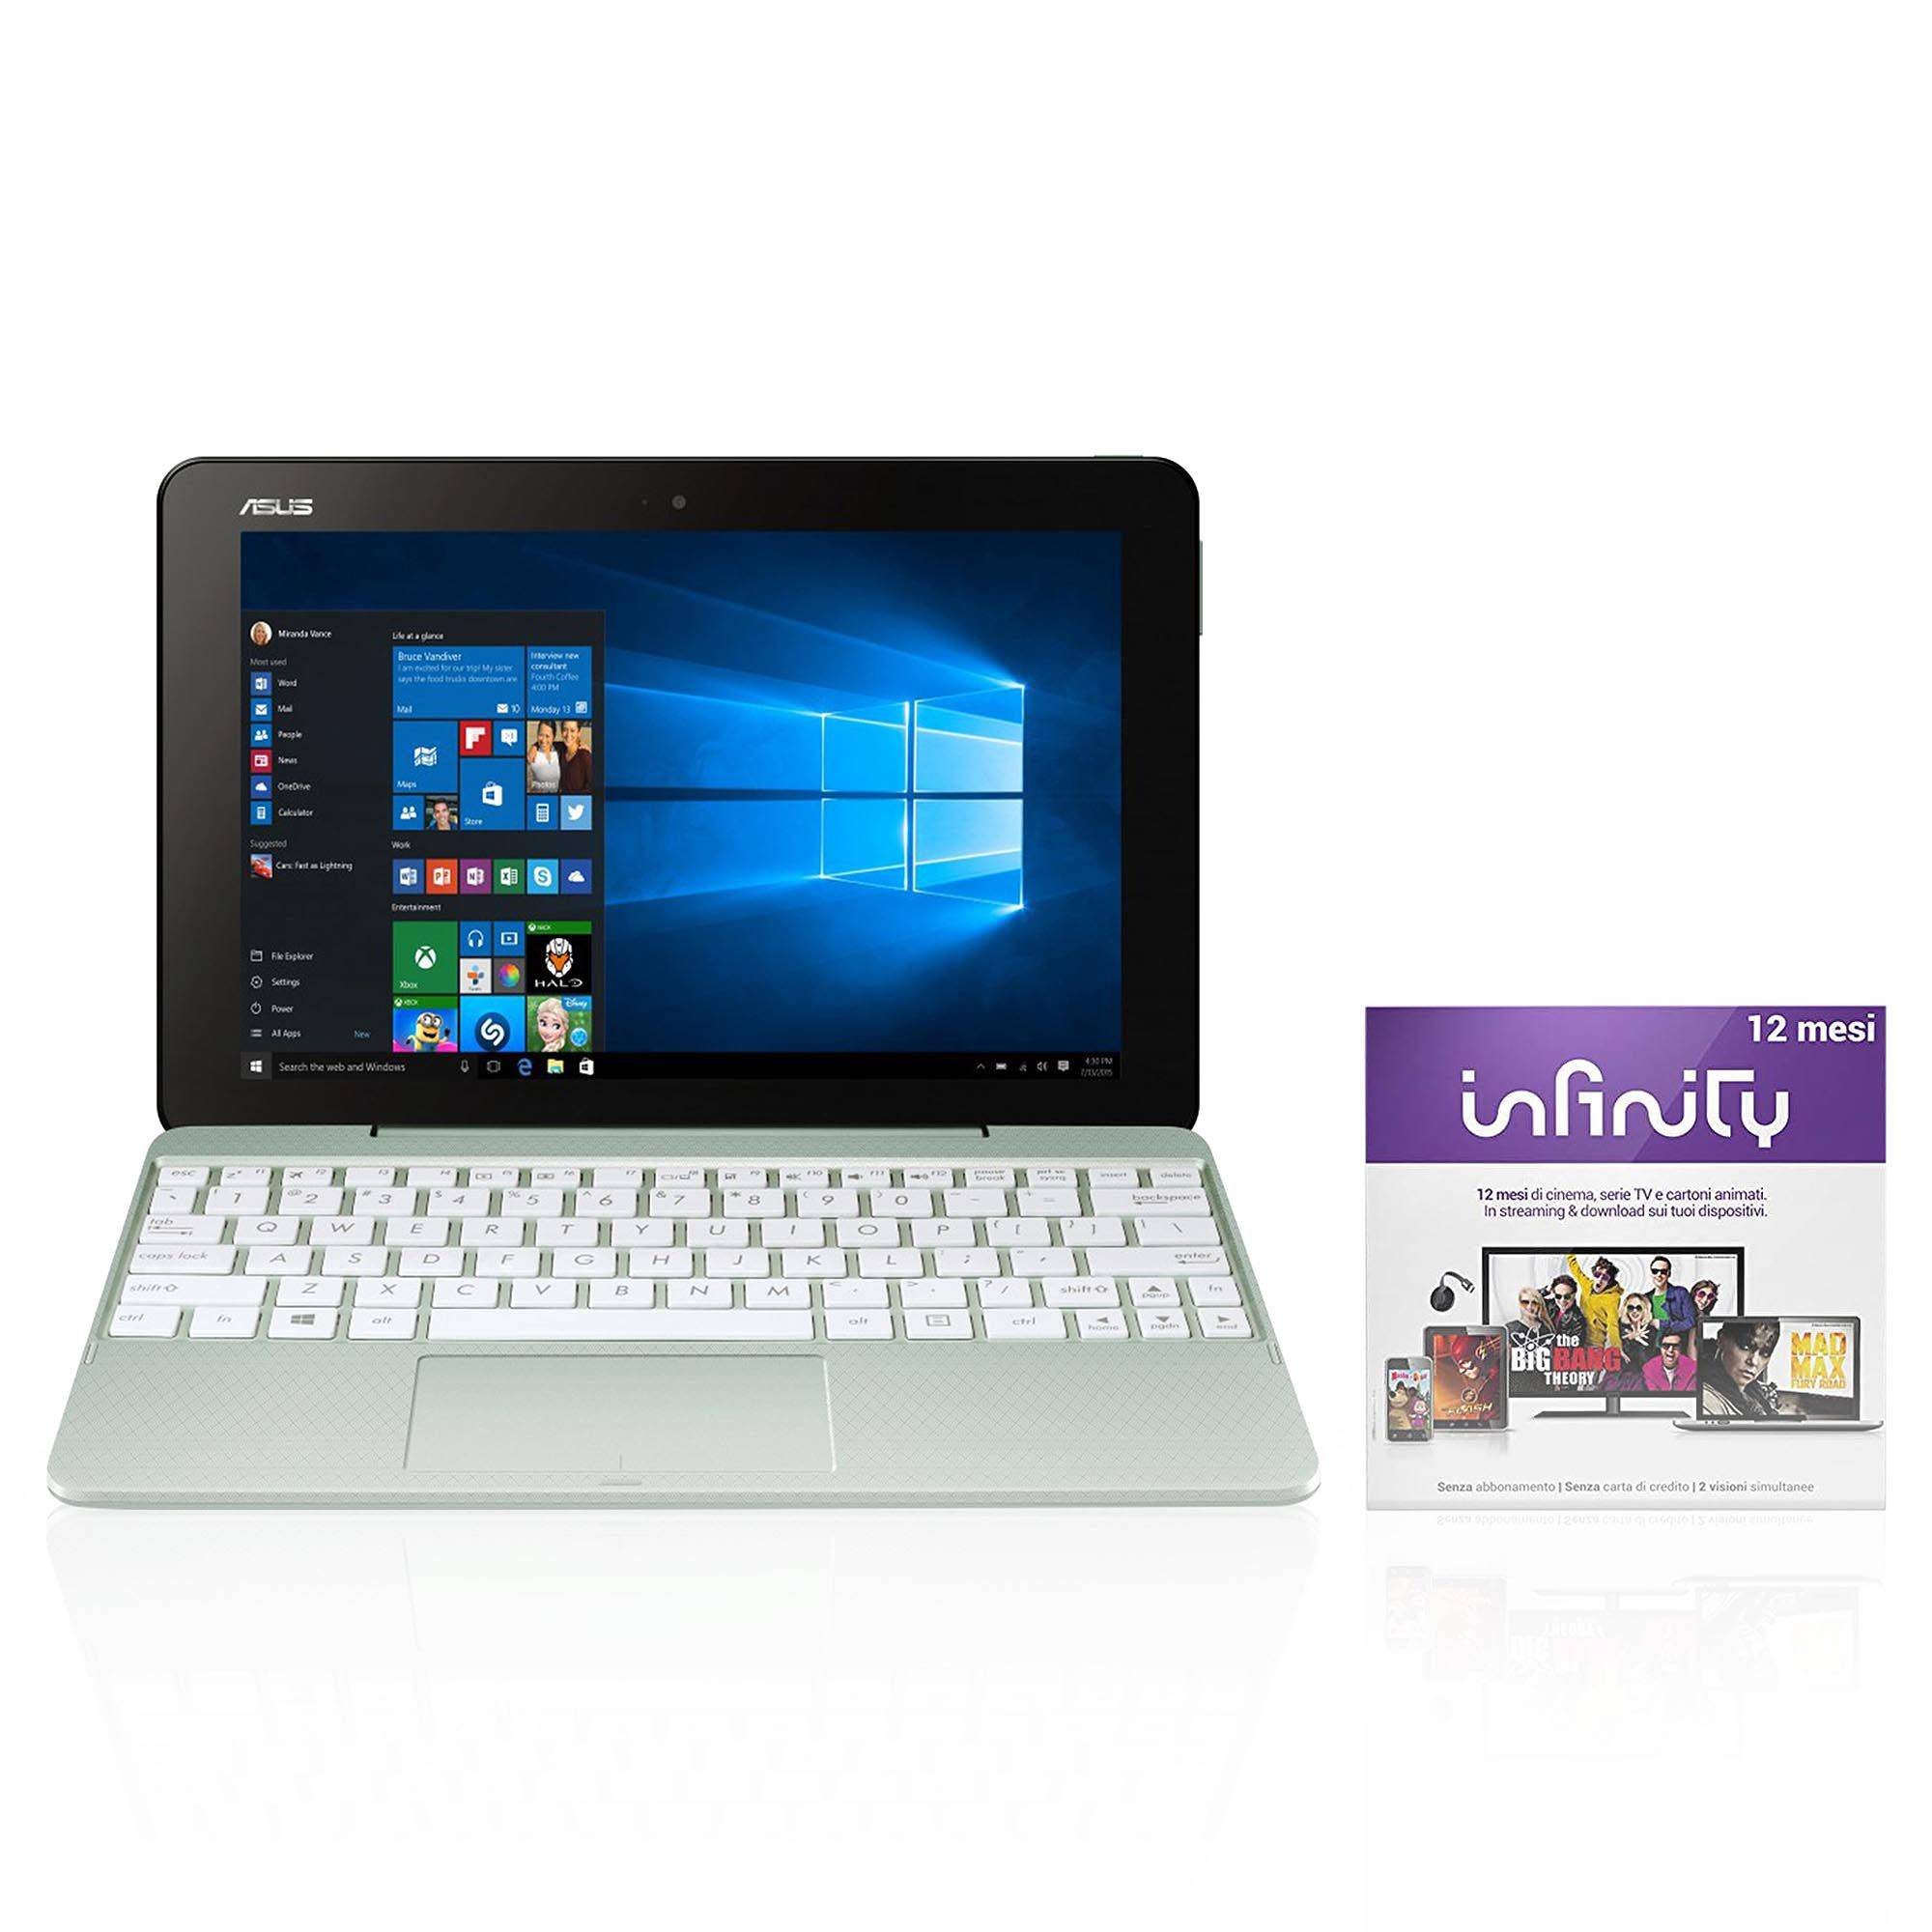 Asus T101HA-GR049T Notebook 2in1 + Infinity 12 mesi